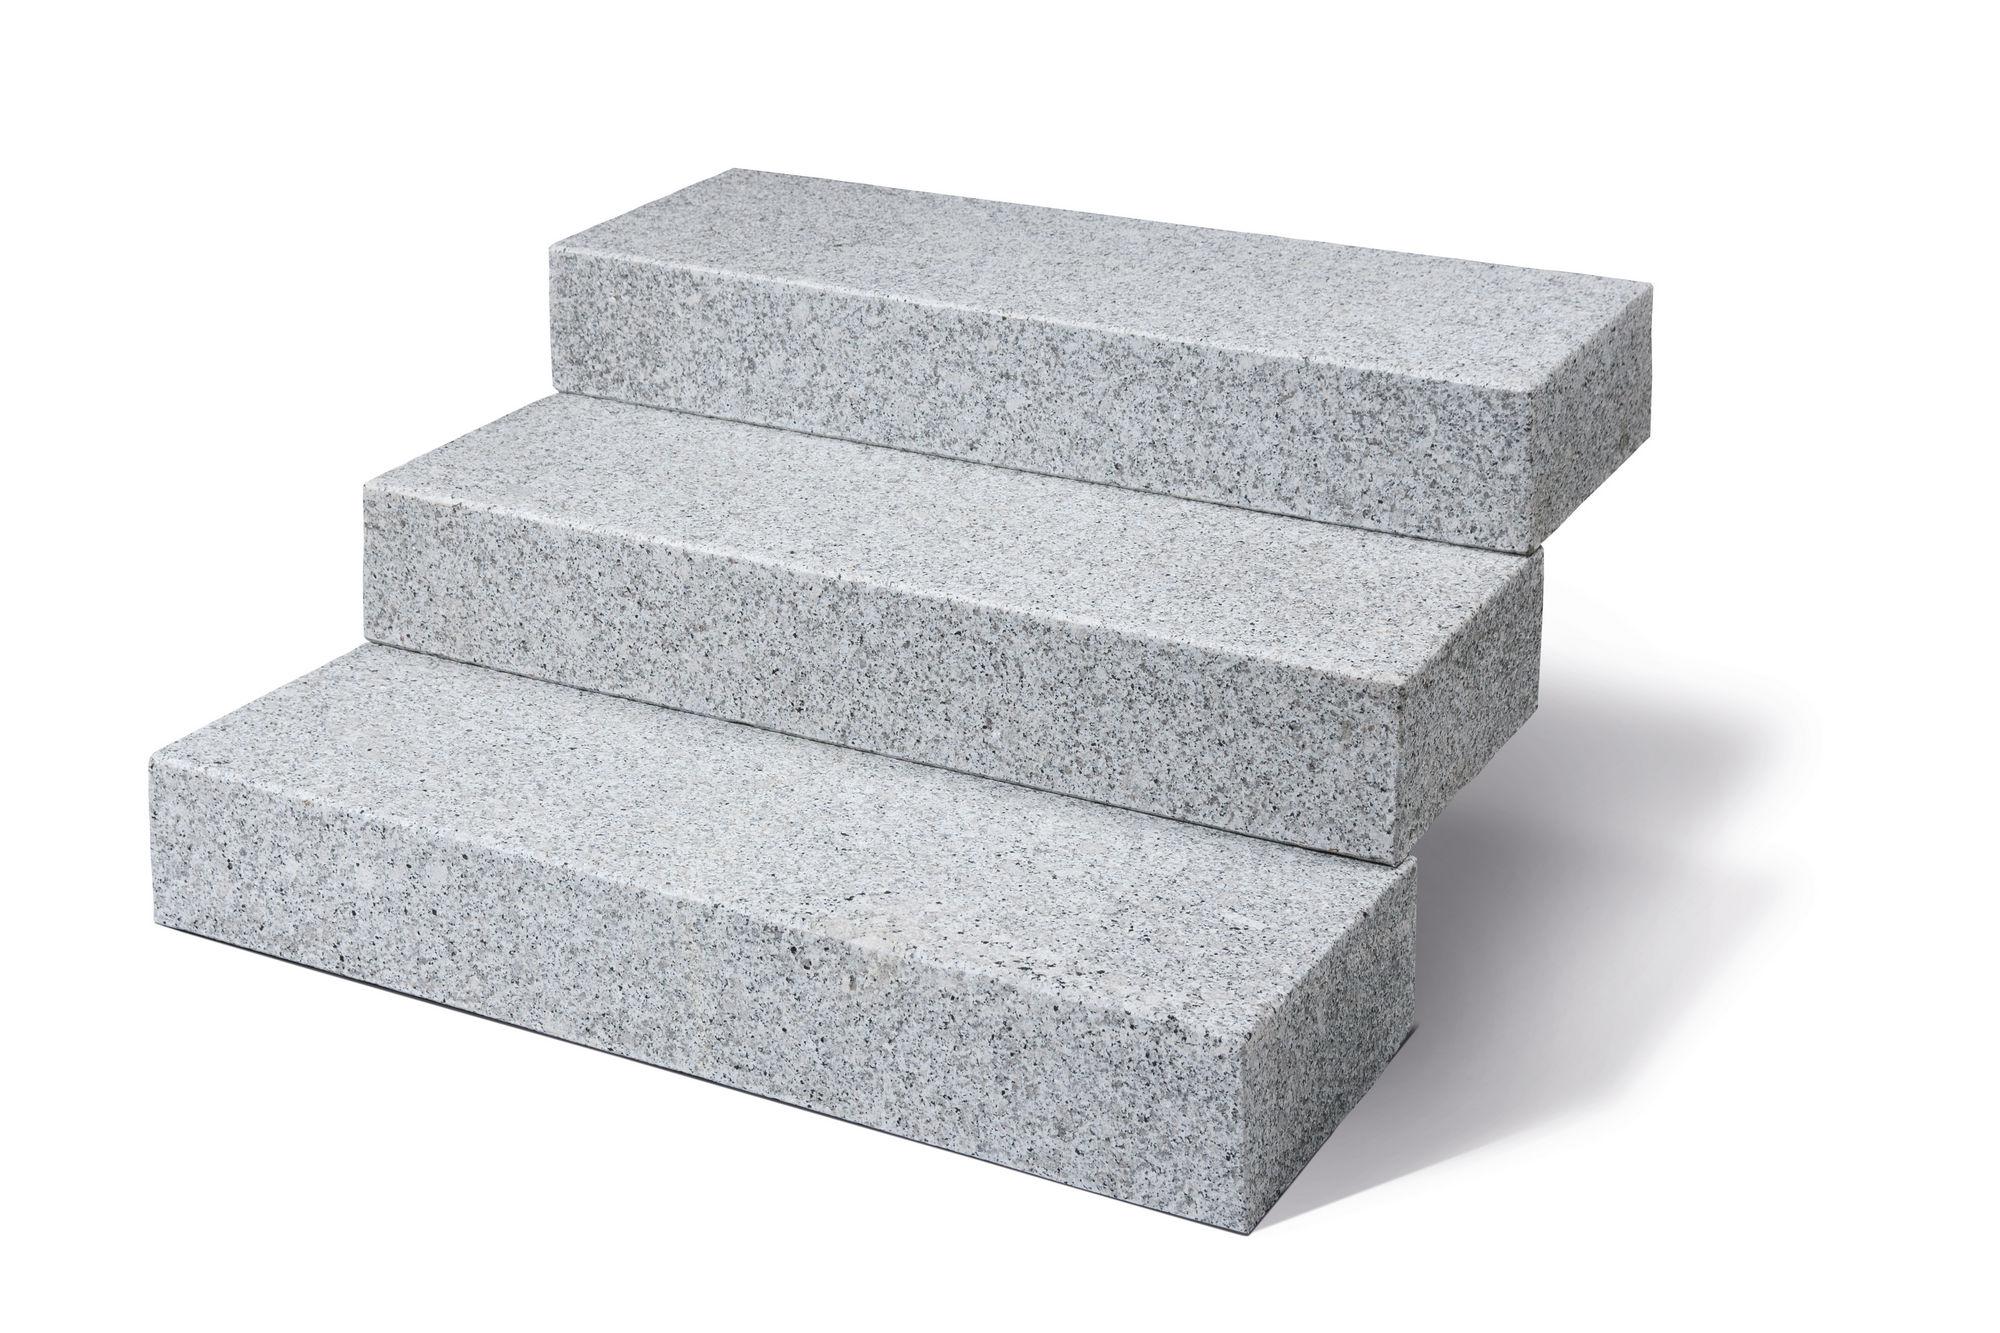 blockstufen granit hellgrau geflammt naturstein baumaterial. Black Bedroom Furniture Sets. Home Design Ideas